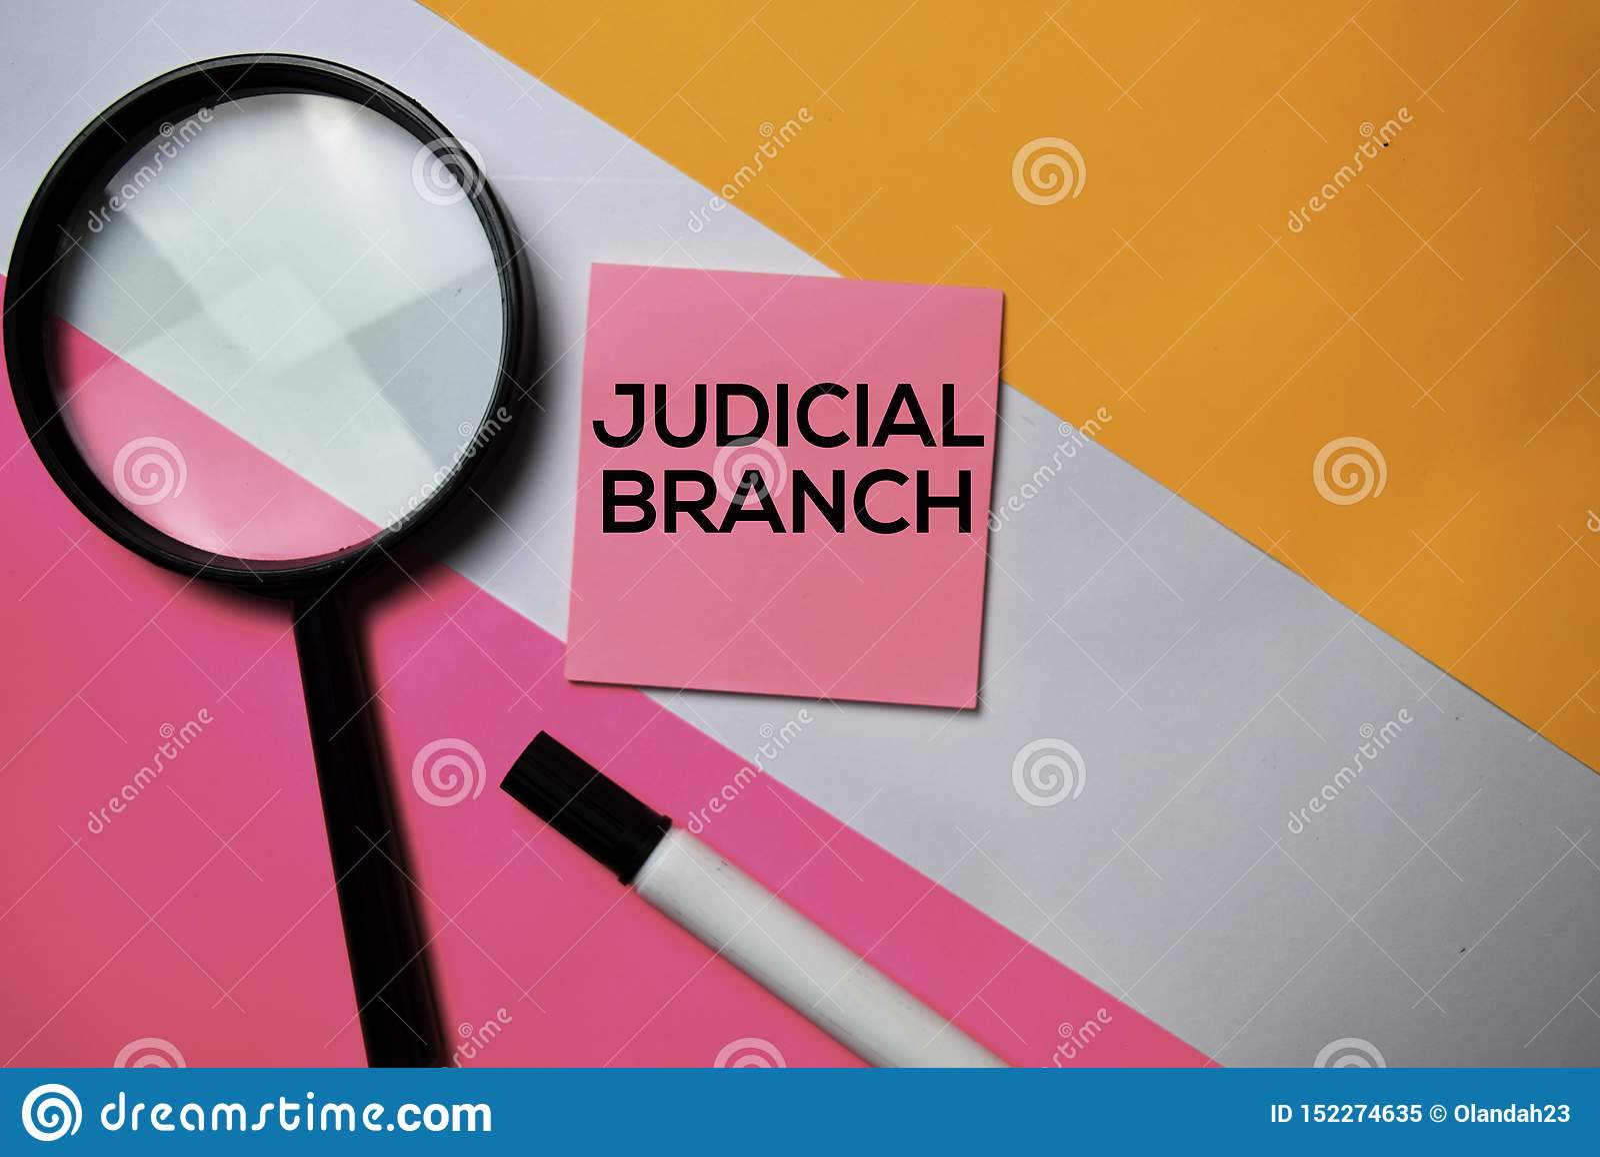 Judicial Branch Stock Photos